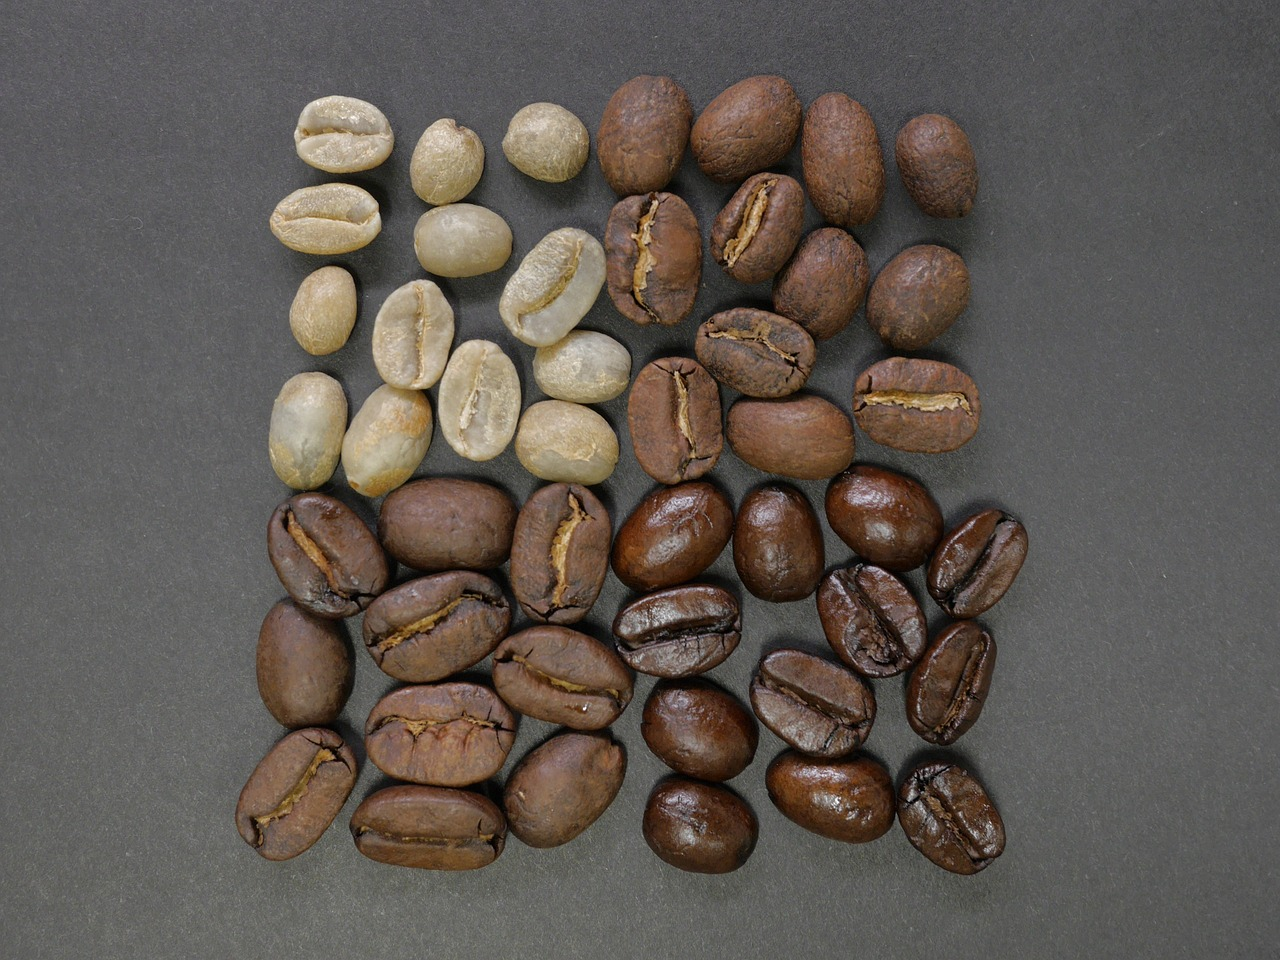 coffee-beans-1082116_1280